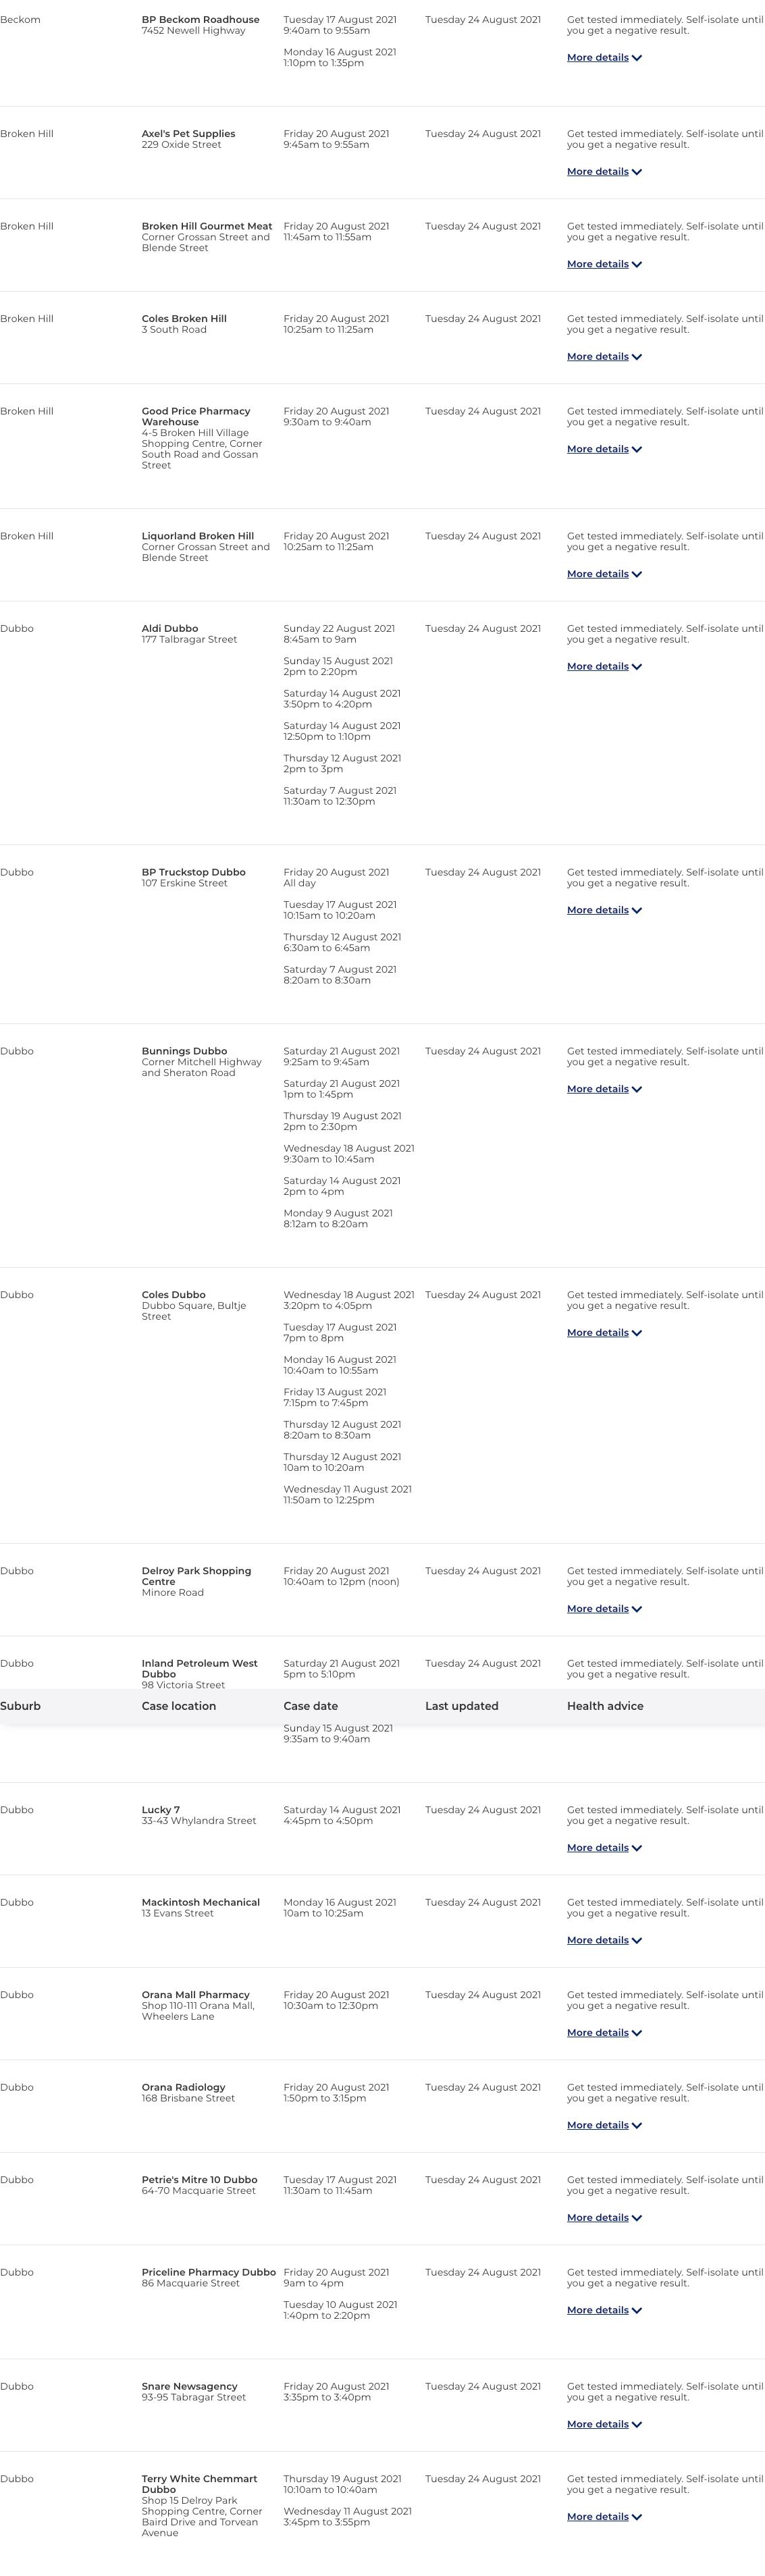 www.nsw.gov.au_covid-19_nsw-covid-19-case-locations_case-locations (1).png